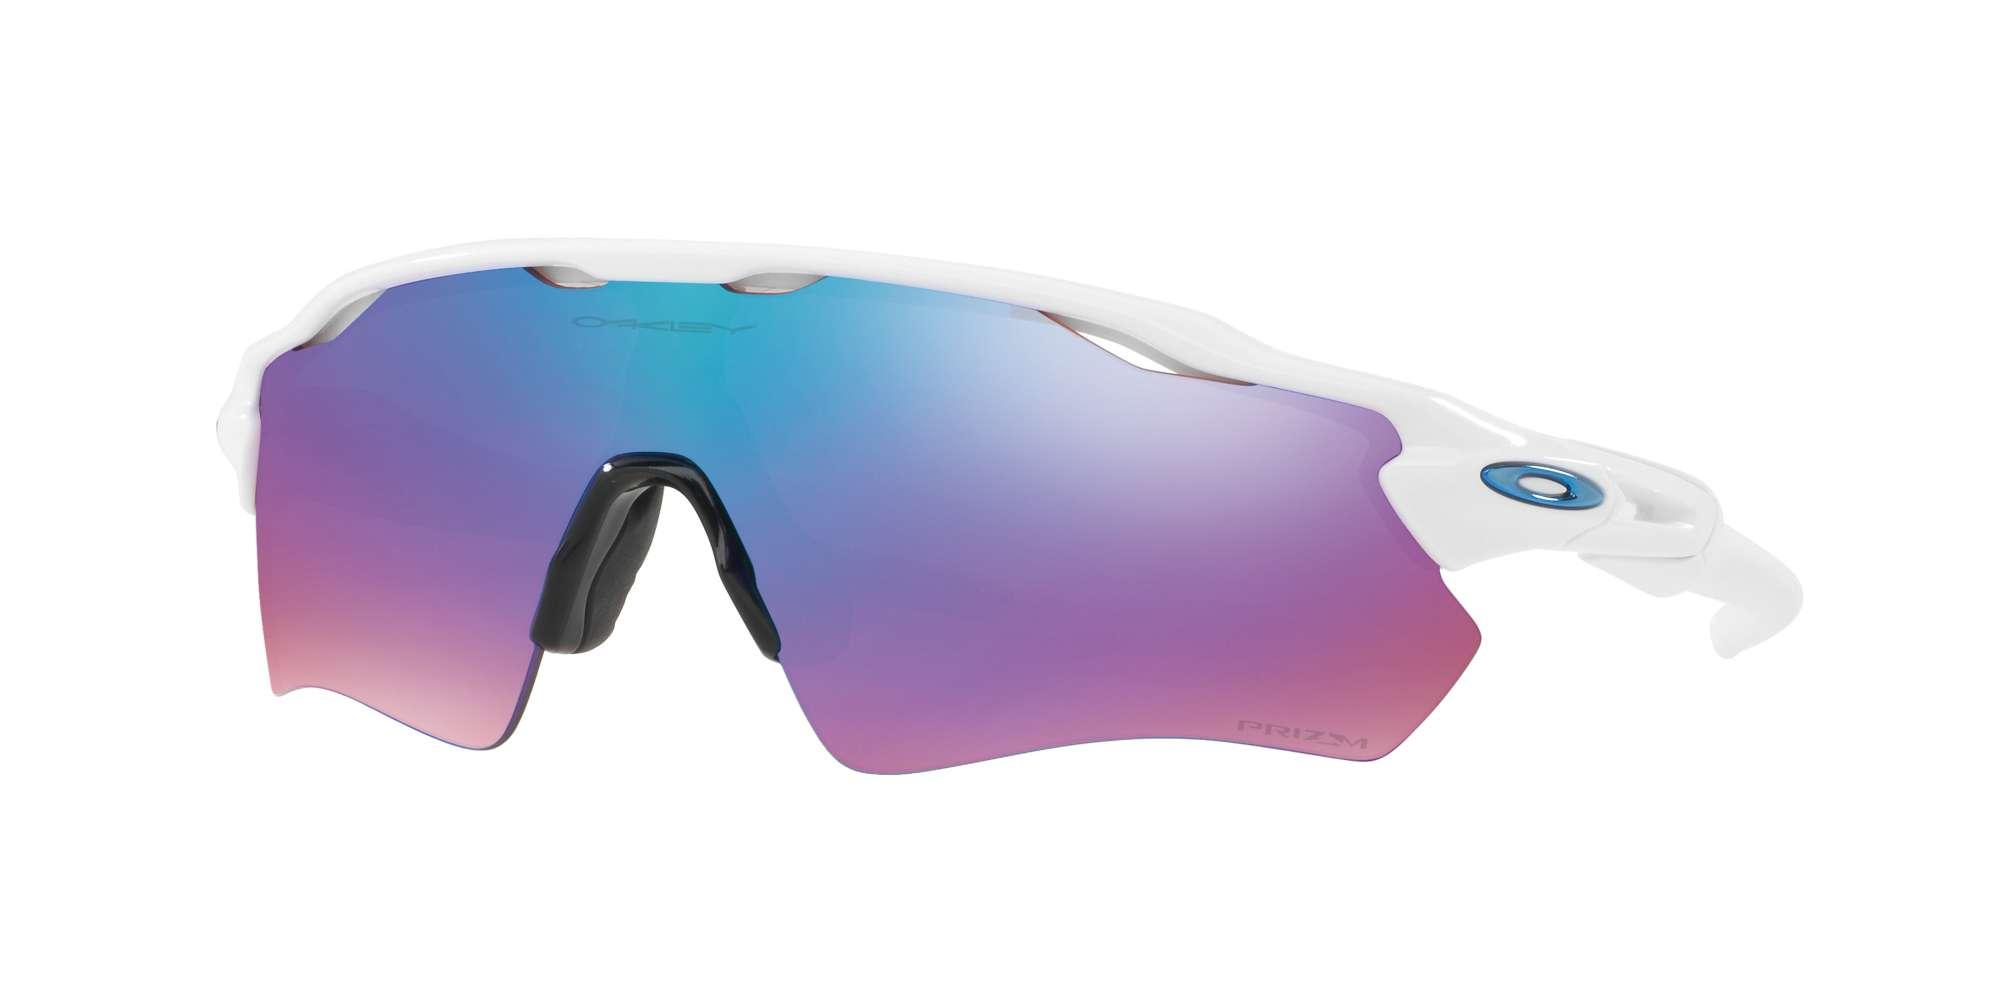 POLISHED WHITE / PRIZM SAPPHIRE SNOW lenses